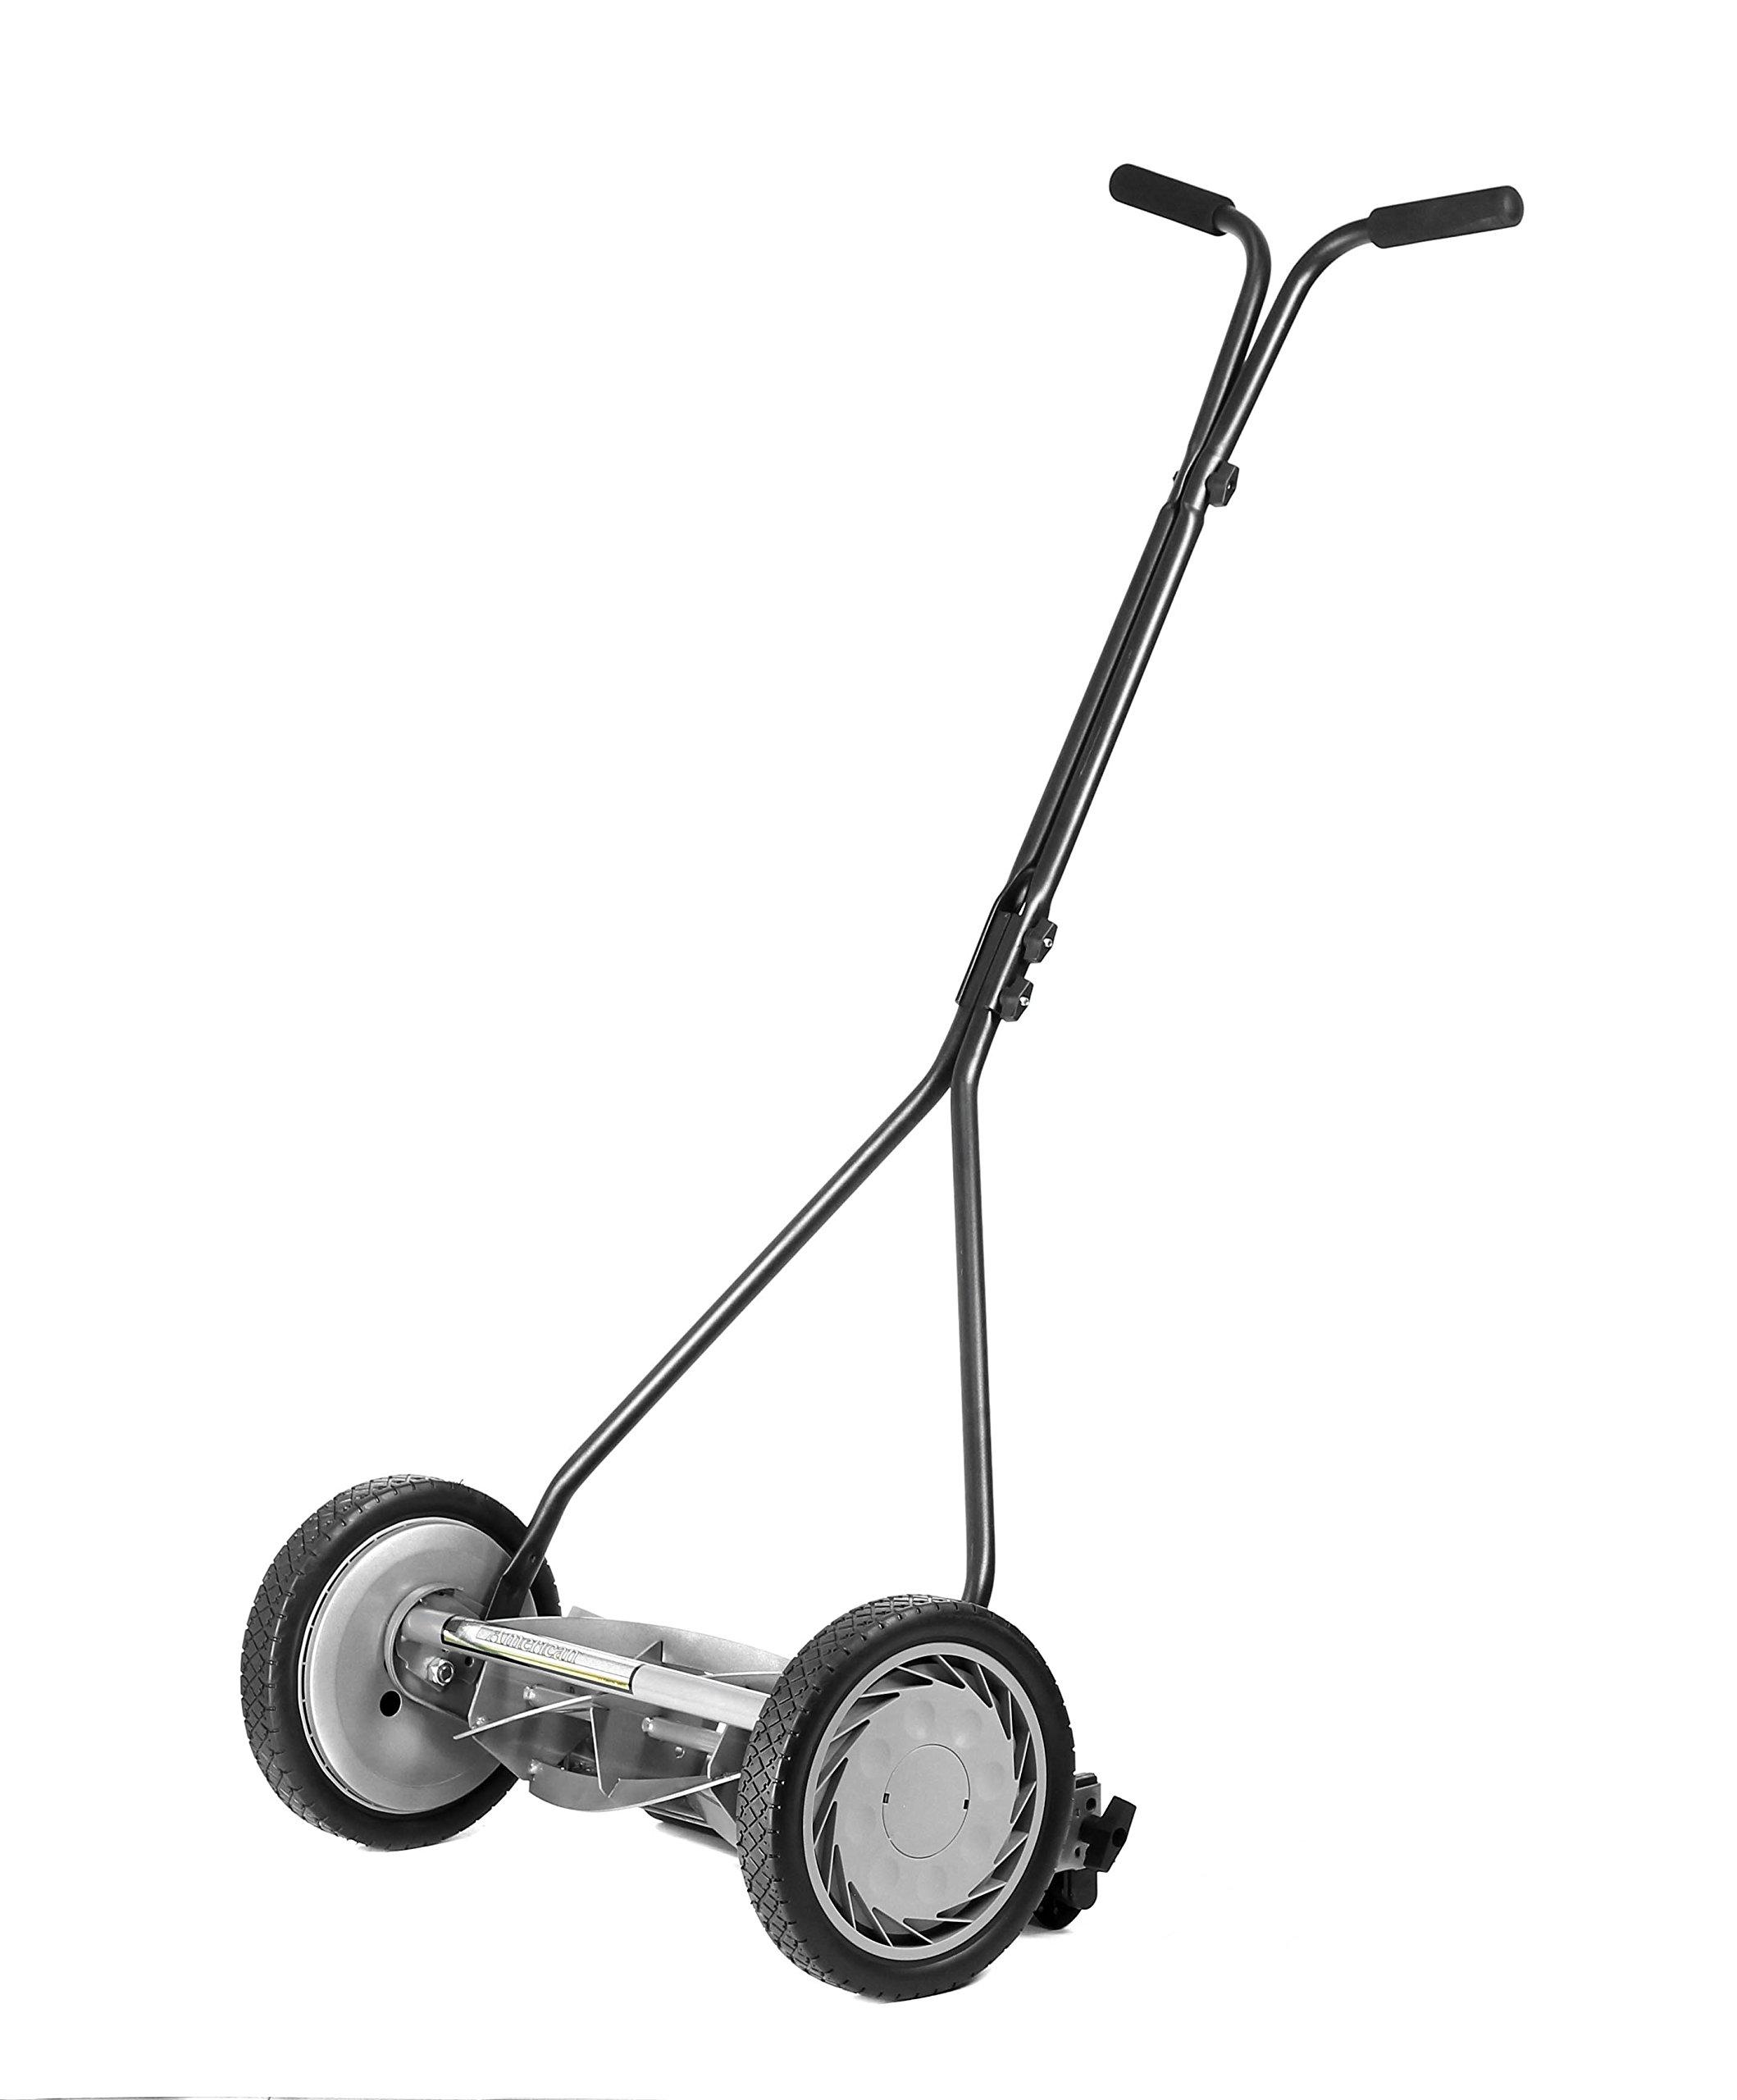 American Lawn Mower Company 1415-16 16-Inch, 5-Blade Push Reel Lawn Mower, 16-Inch, 5-Blade